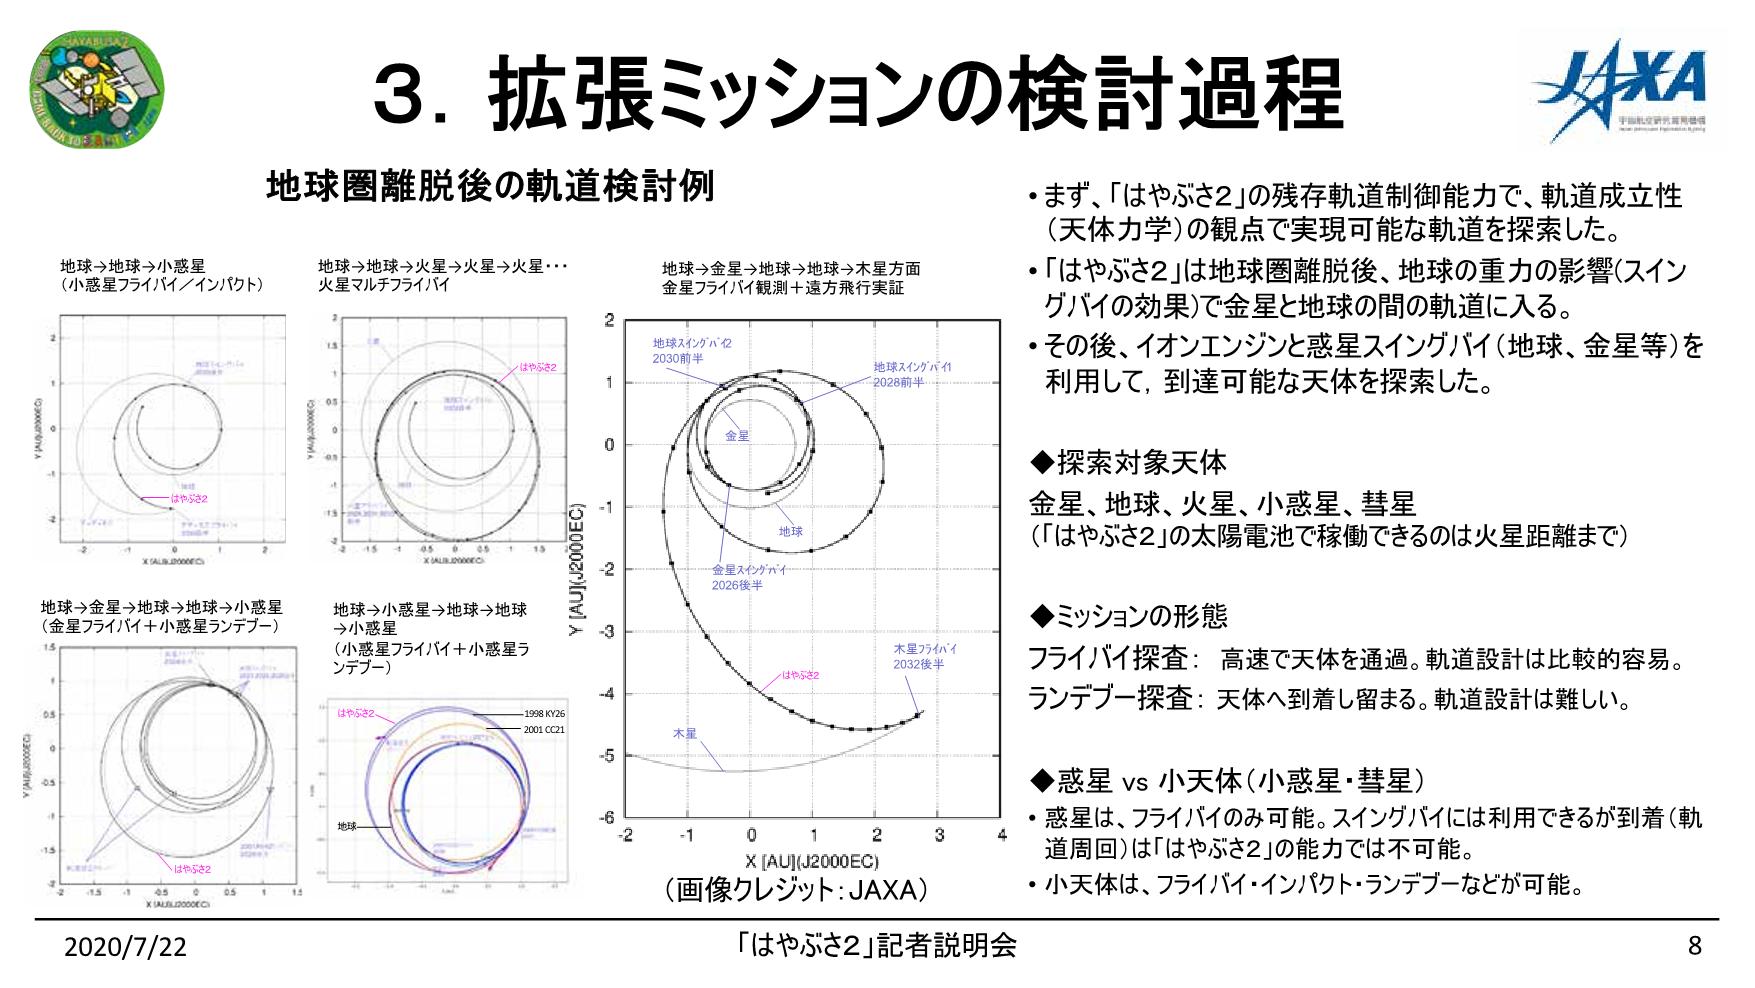 f:id:Imamura:20200722140654p:plain